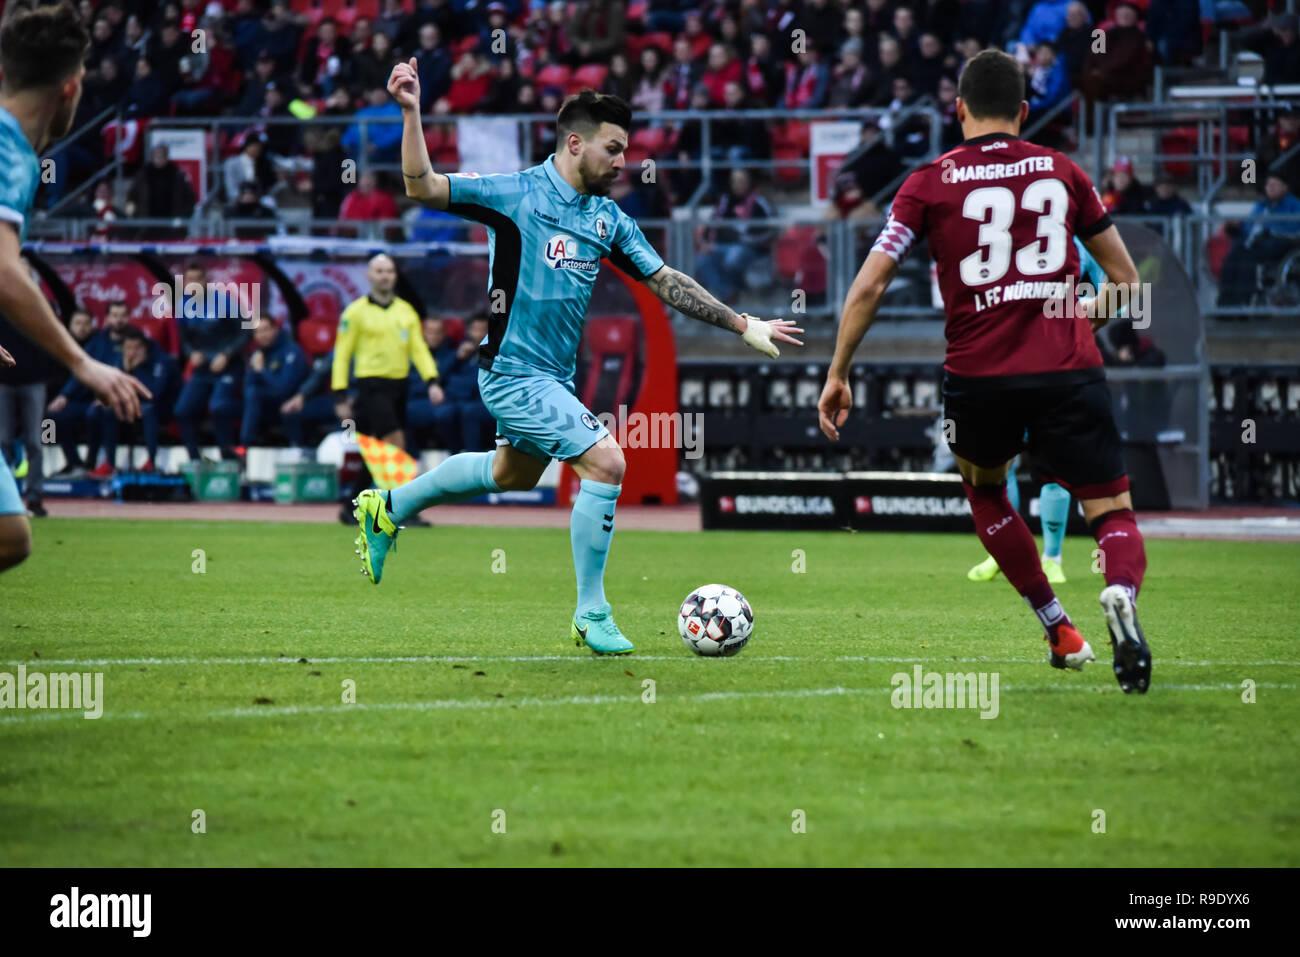 Germany, NŸrnberg, Max Morlock Stadion - 22 Dec 2018 - Soccer, 1.Bundesliga - 1.FC NŸrnberg vs. SC Freiburg -  Image: (From L-R)  Manuel Gulde (SC Freiburg, #5), Georg Margreitter (1. FC NŸrnberg, #33)  Foto: HMB Media / Ryan Evans Credit: Ryan Evans/Alamy Live News - Stock Image